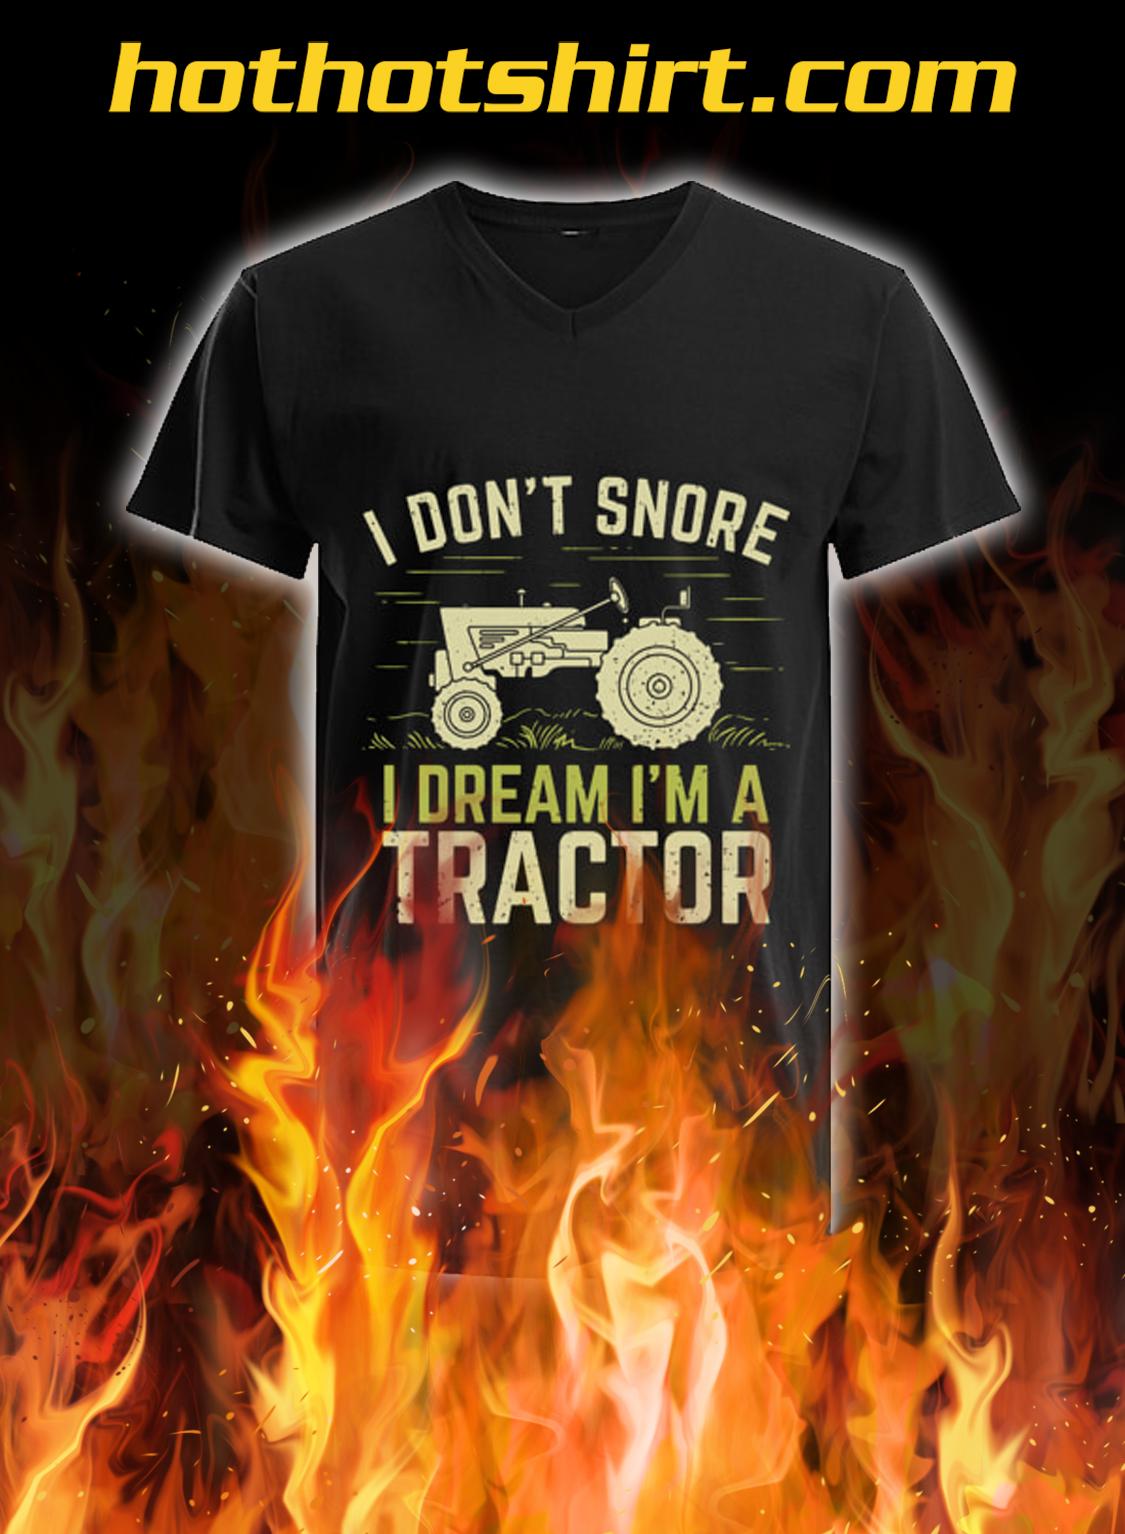 I Don't snore i dream i'm a tractor v-neck